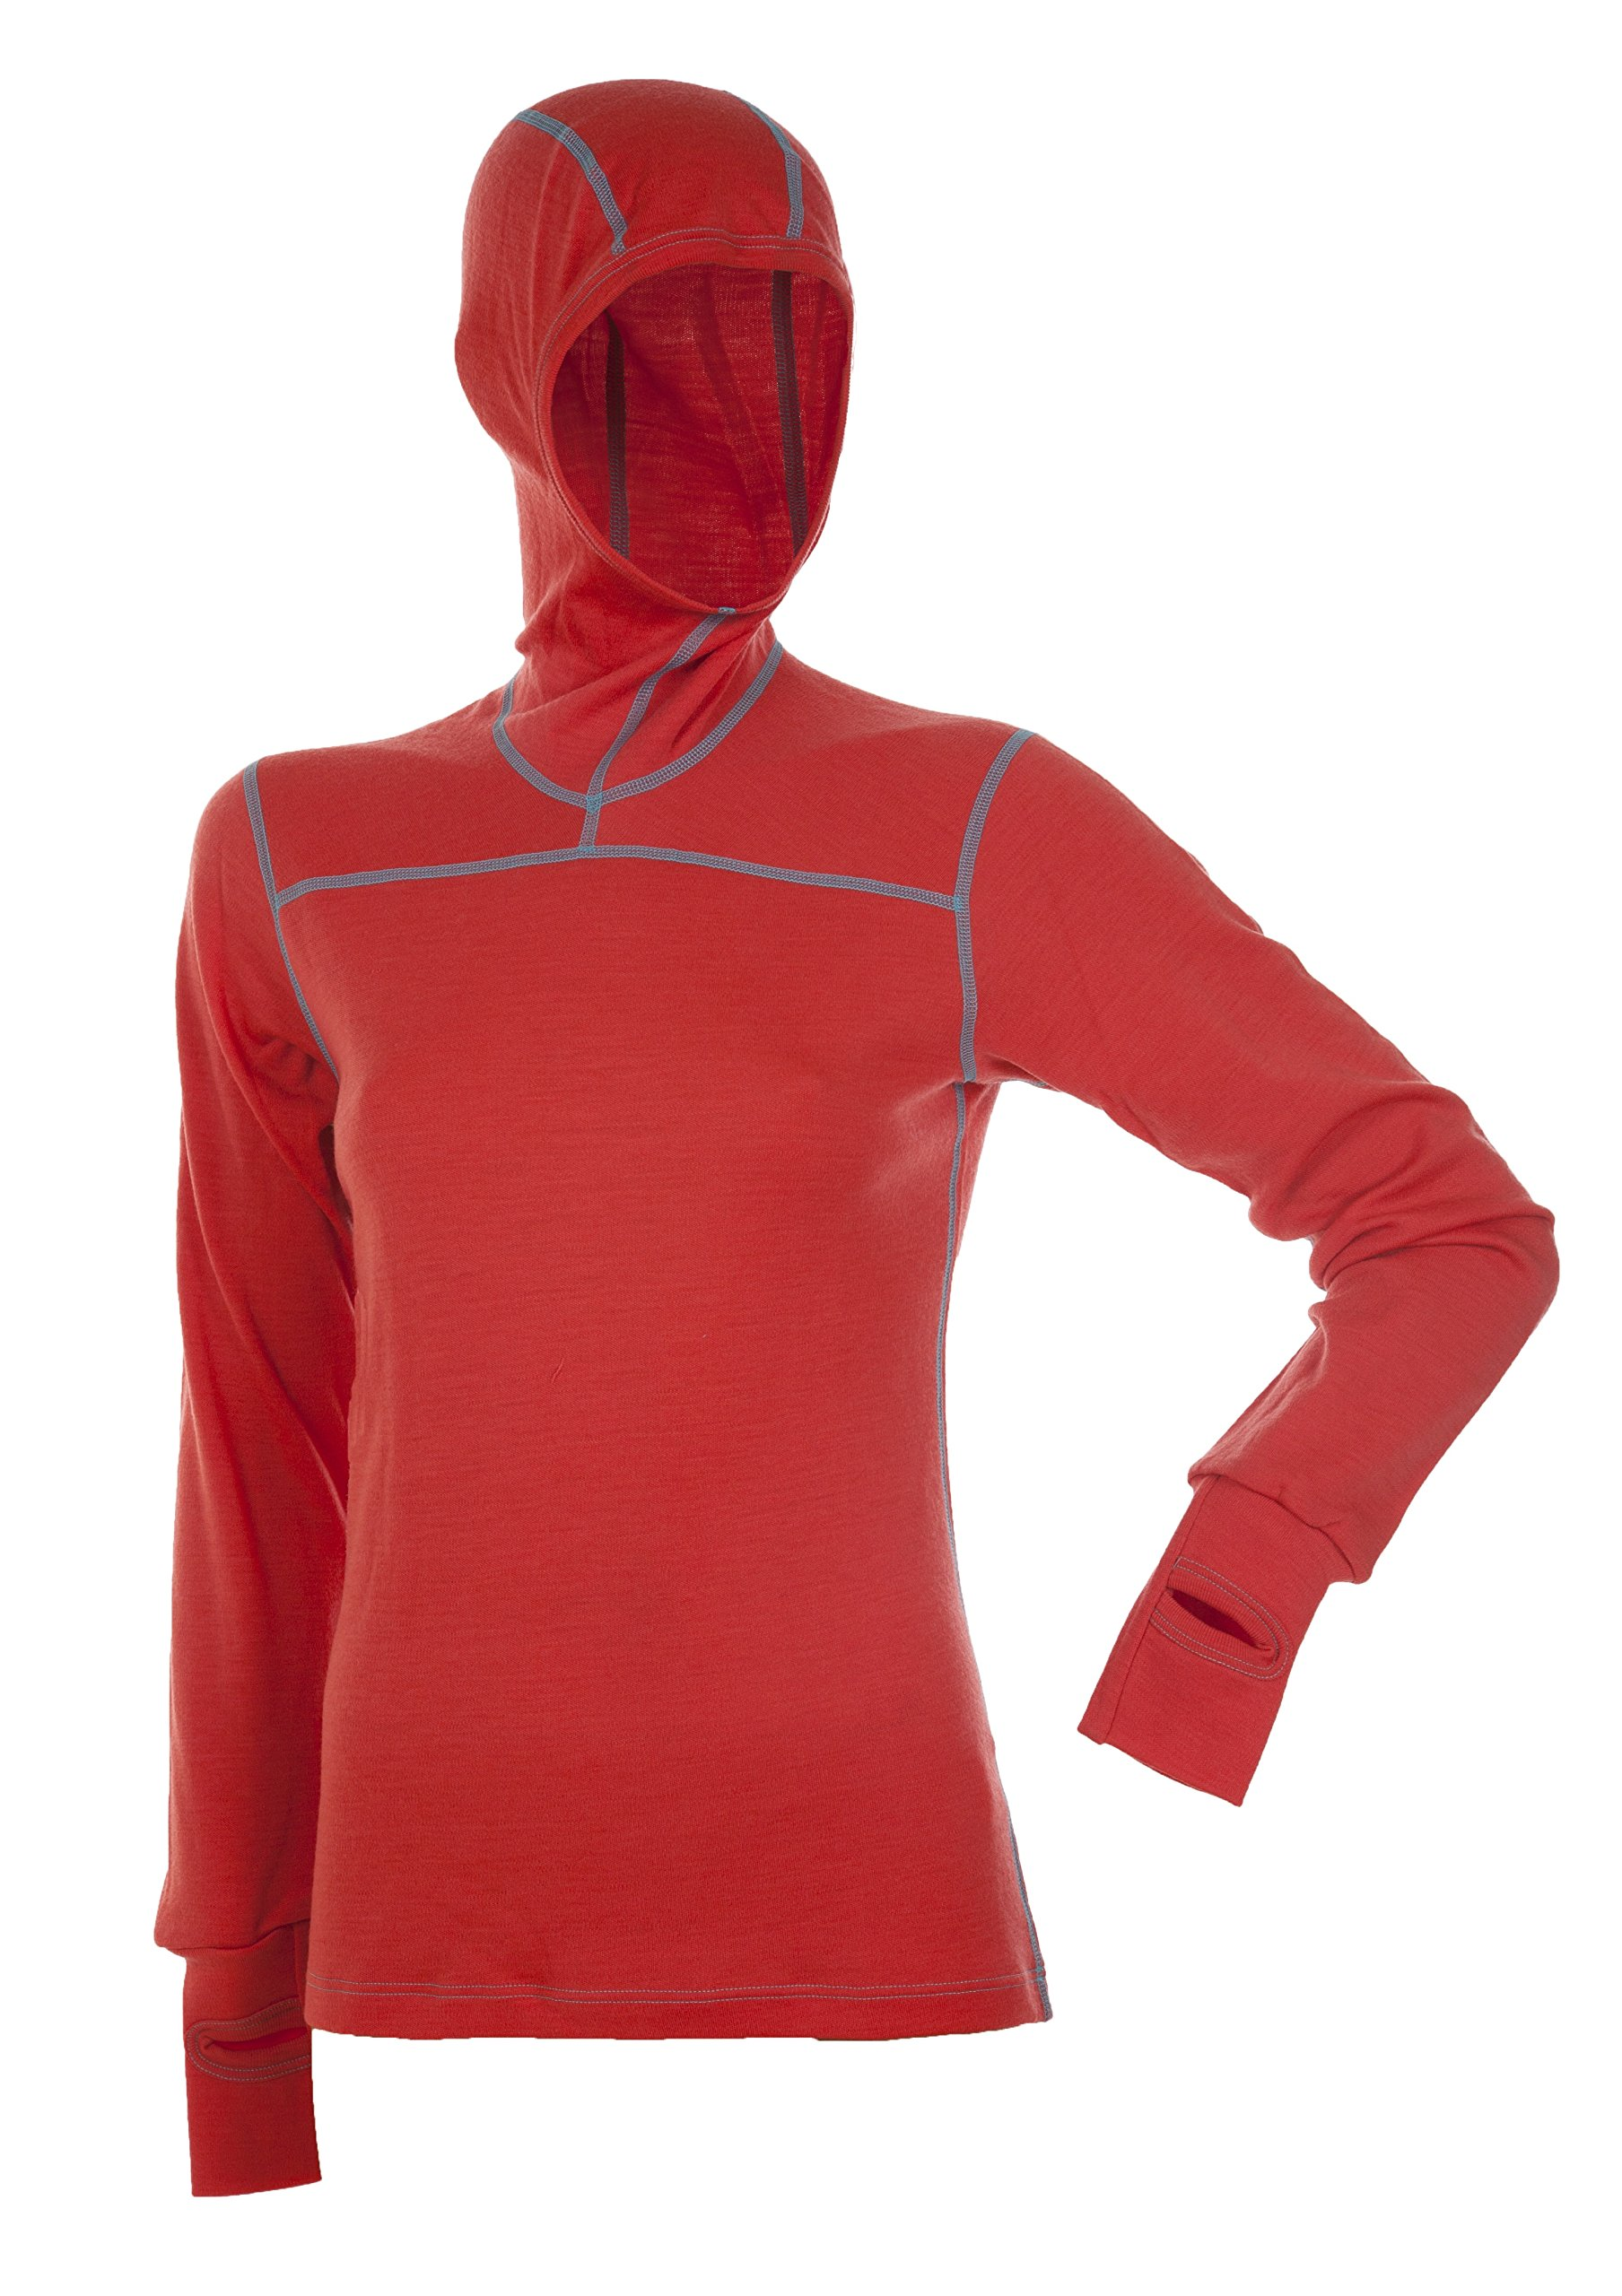 Janus 100% Merino Wool Women's Long Sleeve W/Hood Machine Washable Made in Norway (Small, Coral)